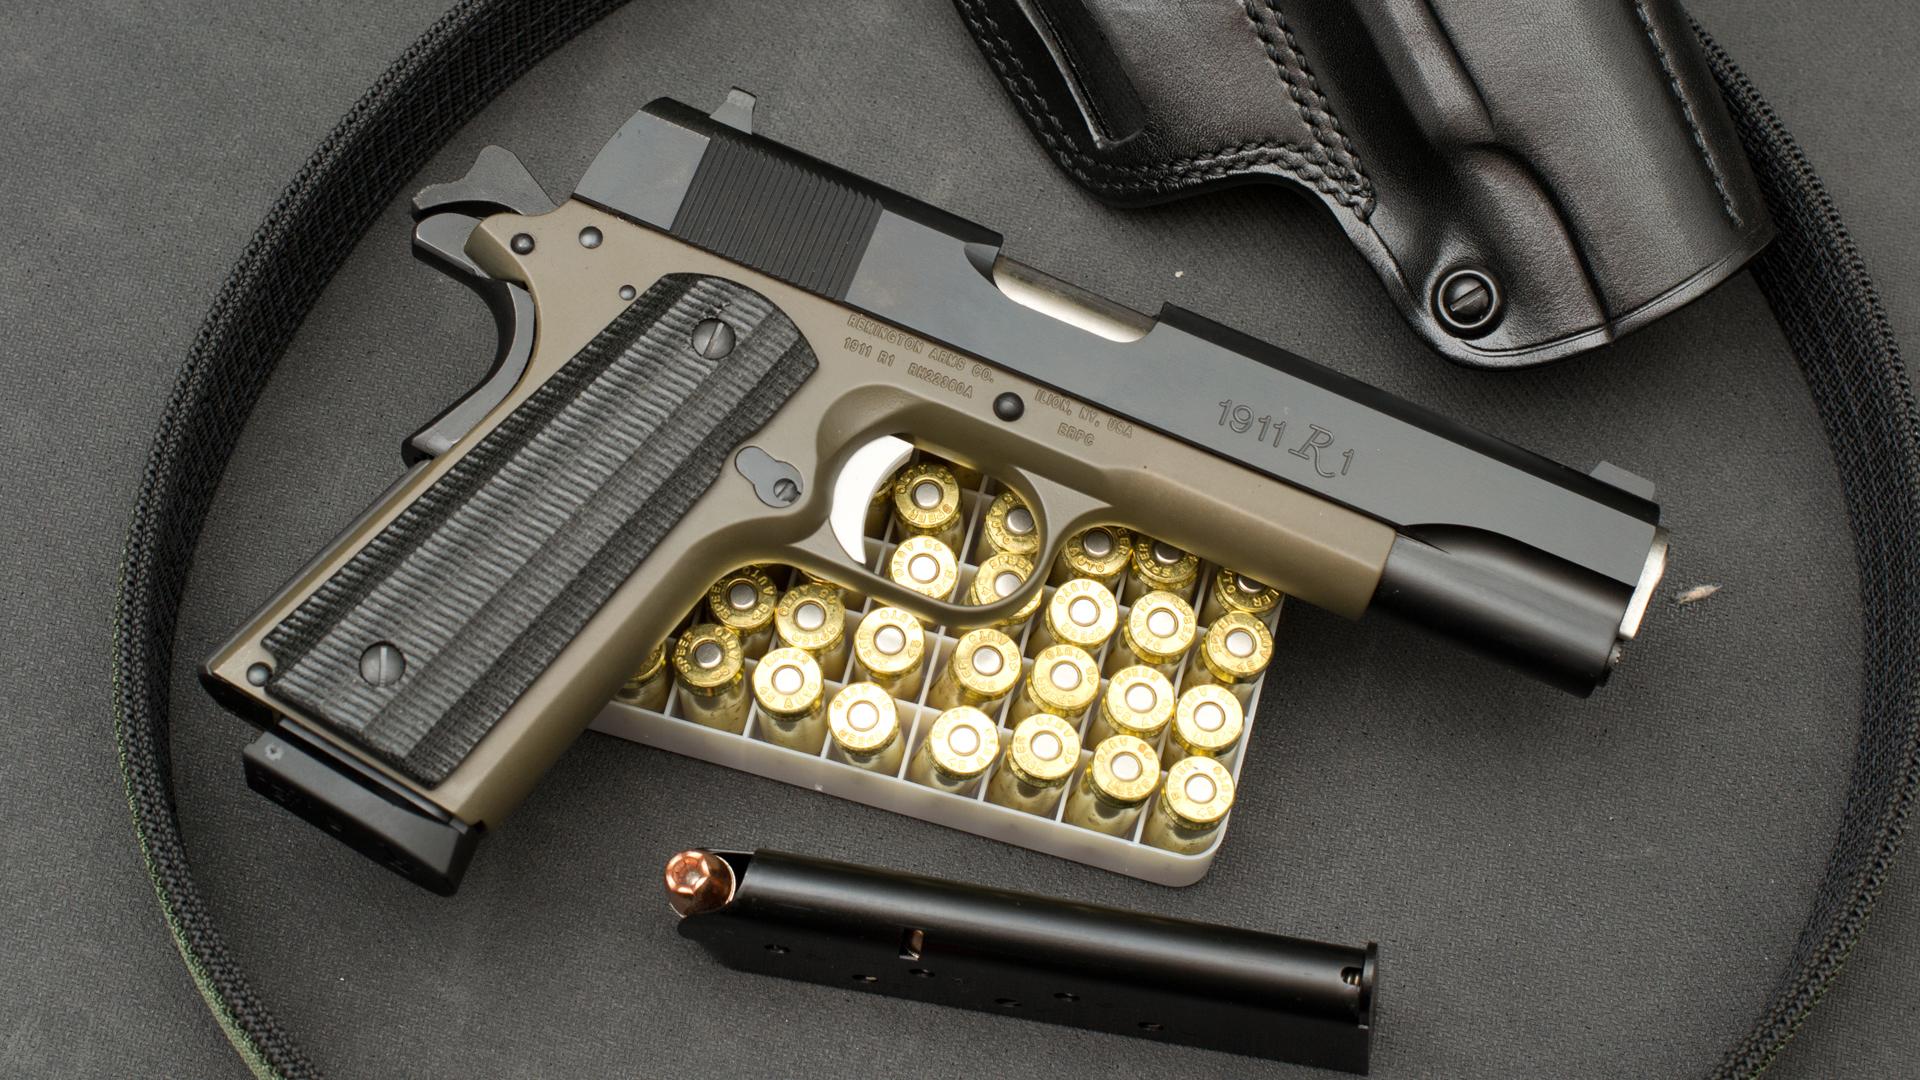 Remington 1911 r1 semi automatic pistol gun 45 wallpapers photos 1920x1080